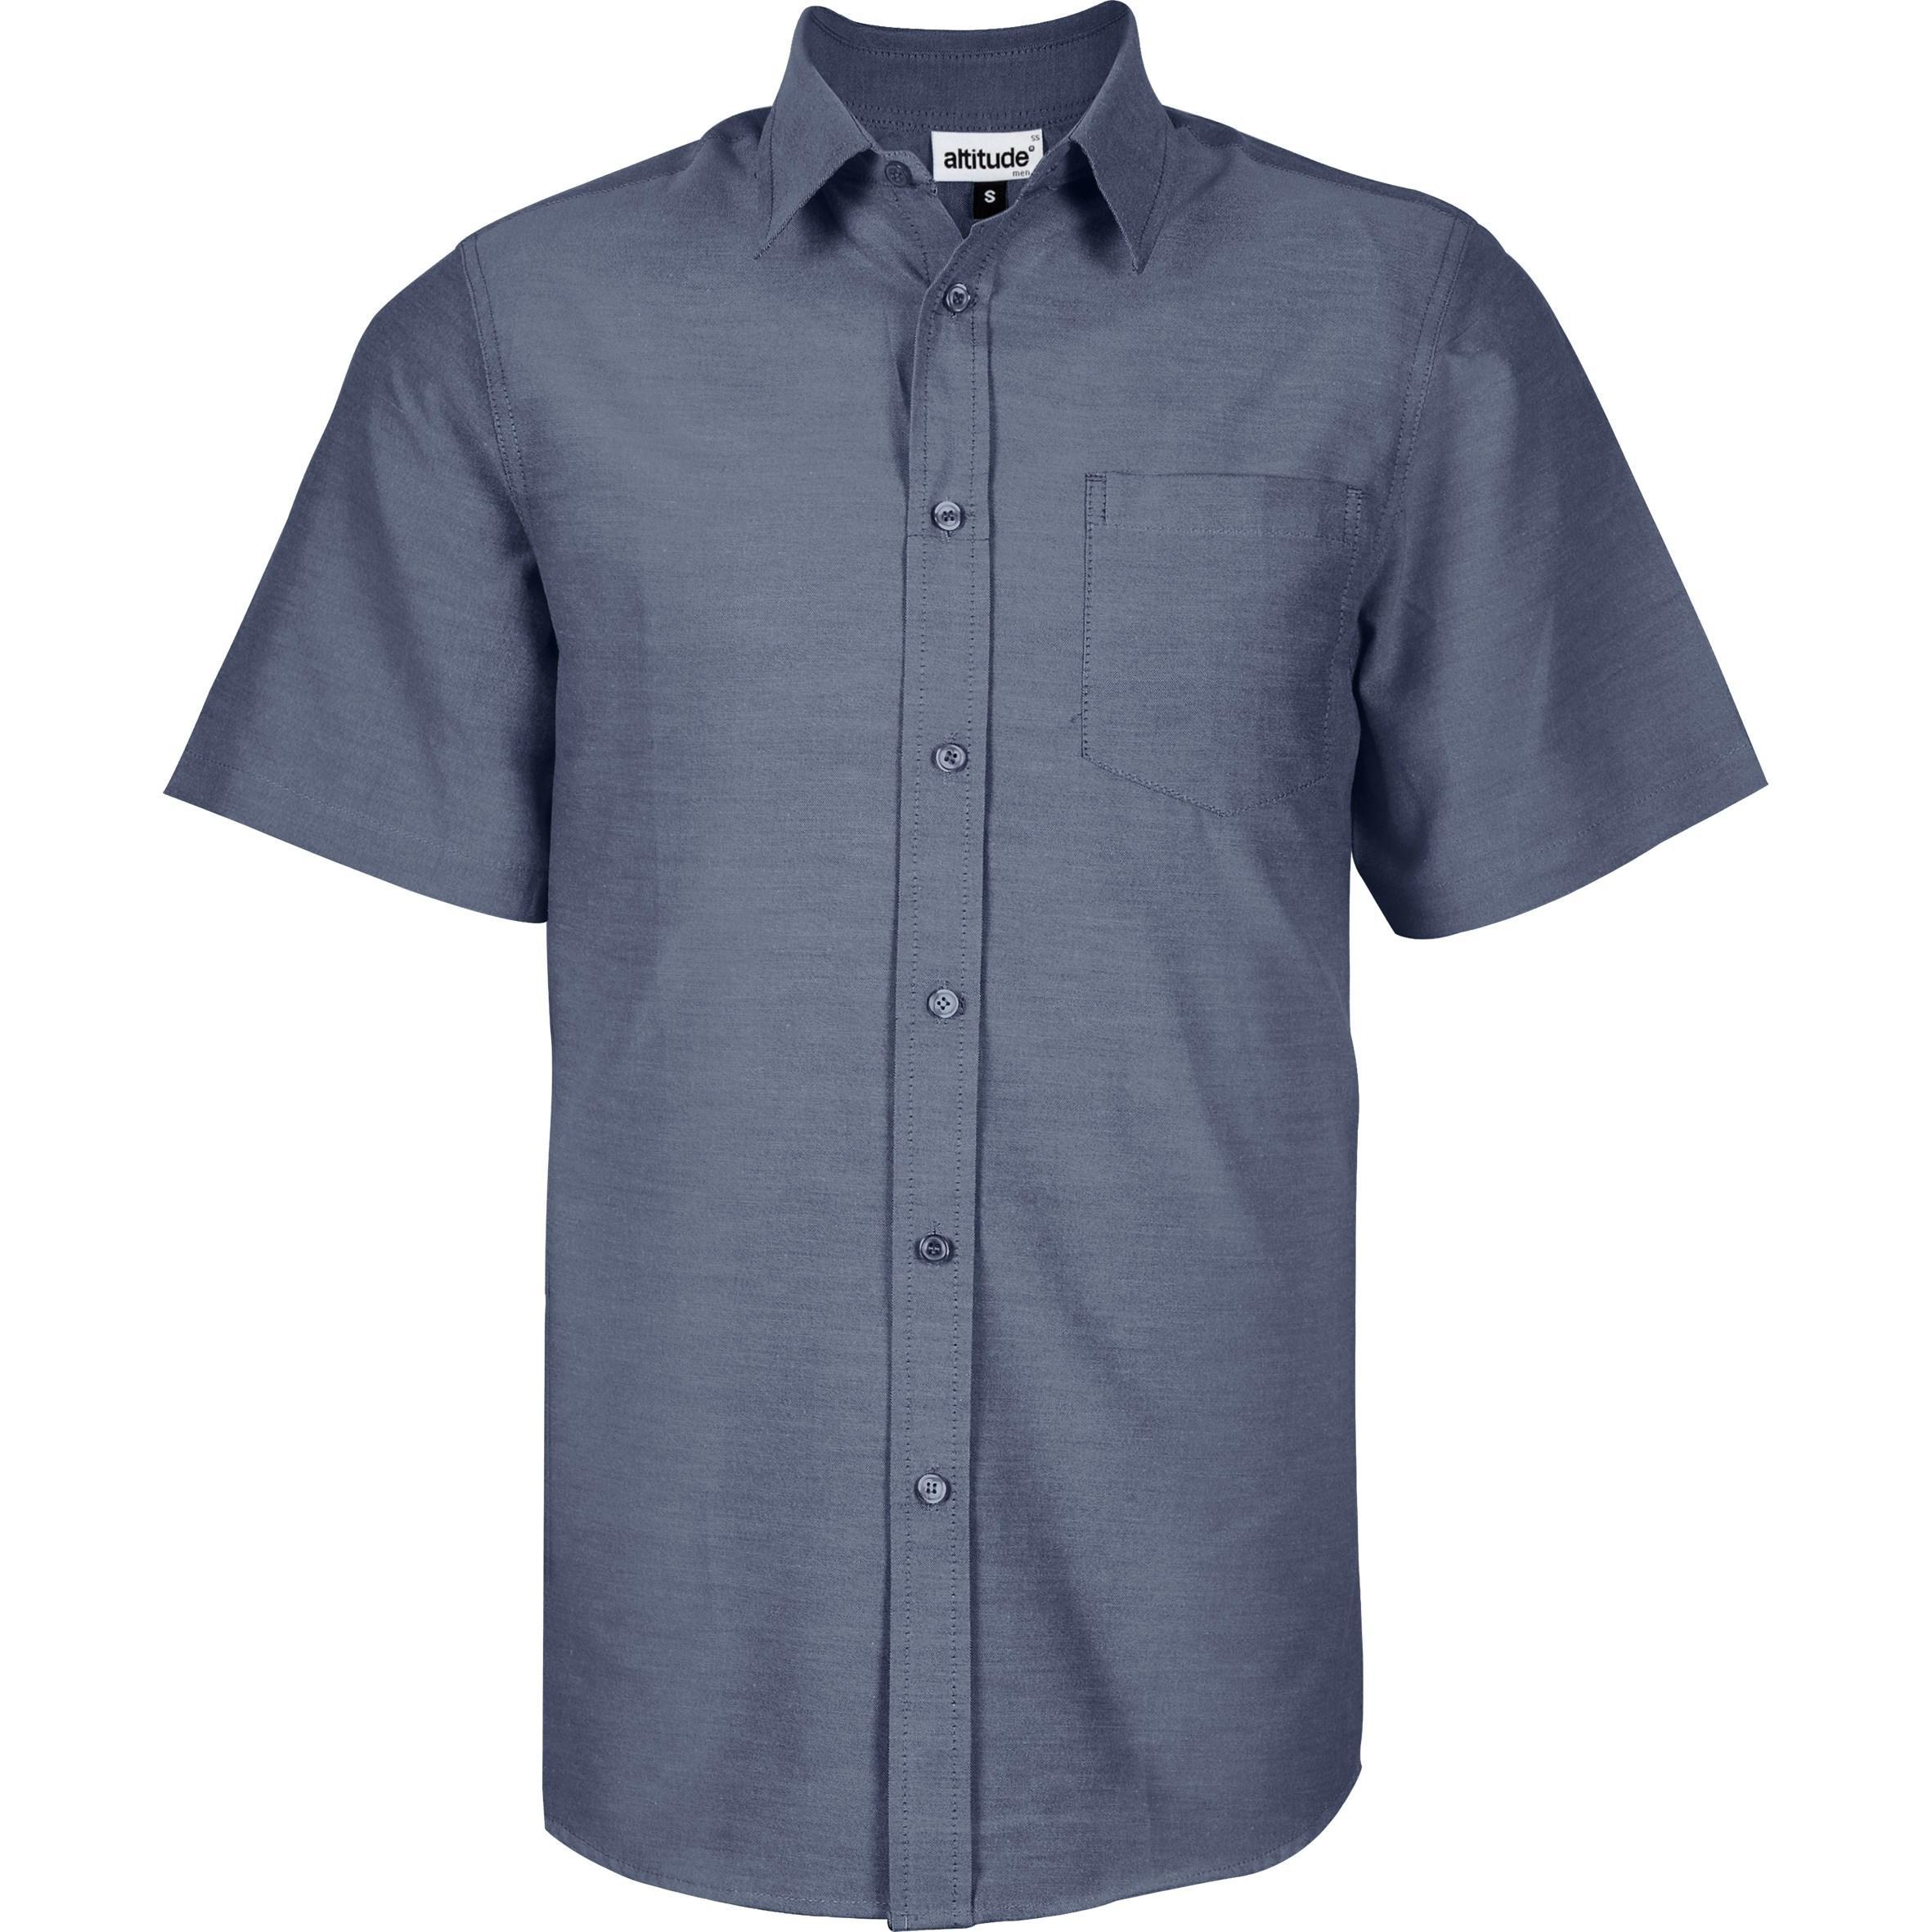 Mens Short Sleeve Oxford Shirt - Navy Only